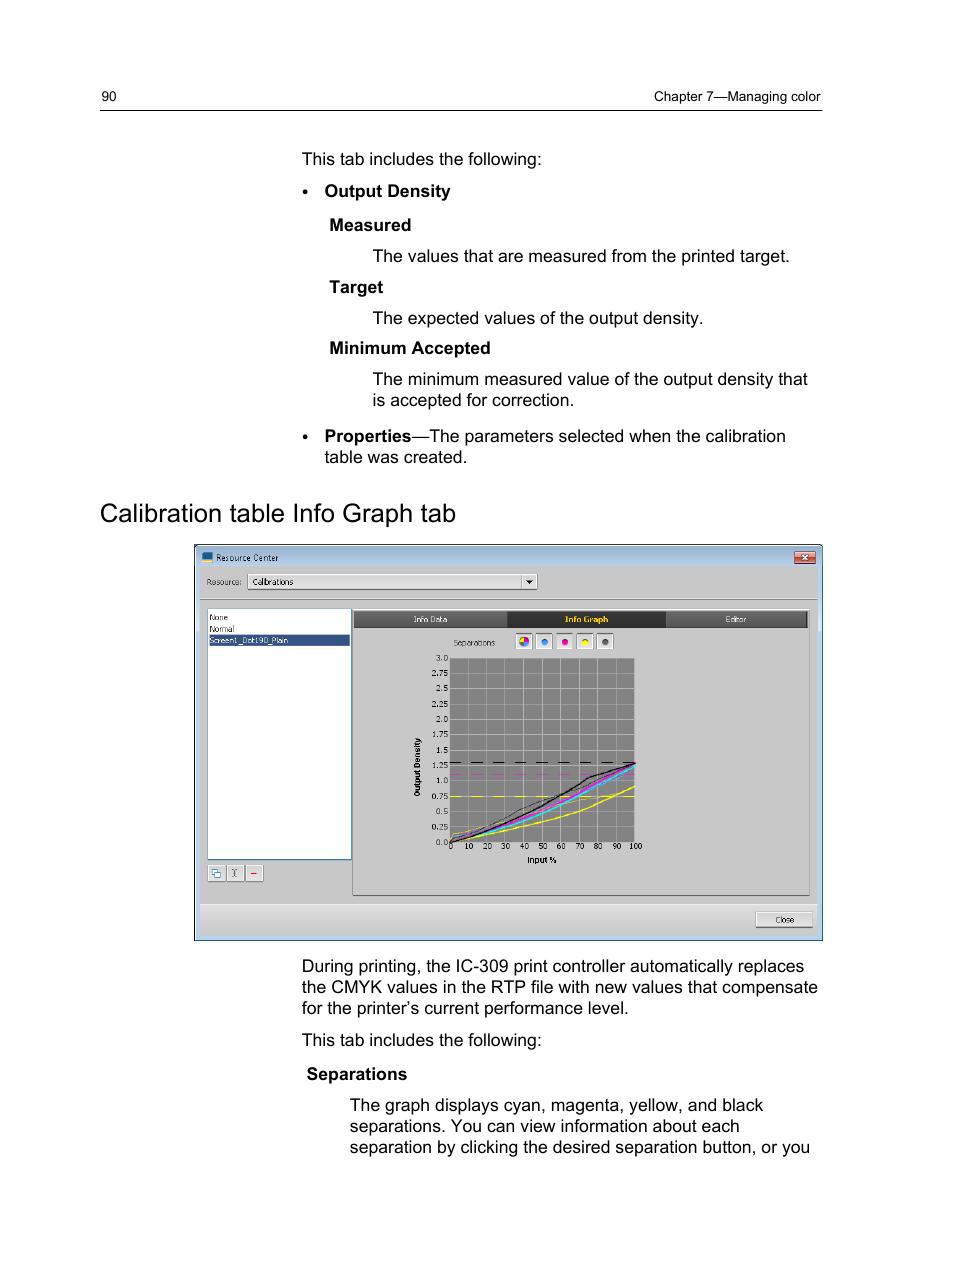 Calibration table info graph tab   Konica Minolta bizhub PRESS C1060 User  Manual   Page 100